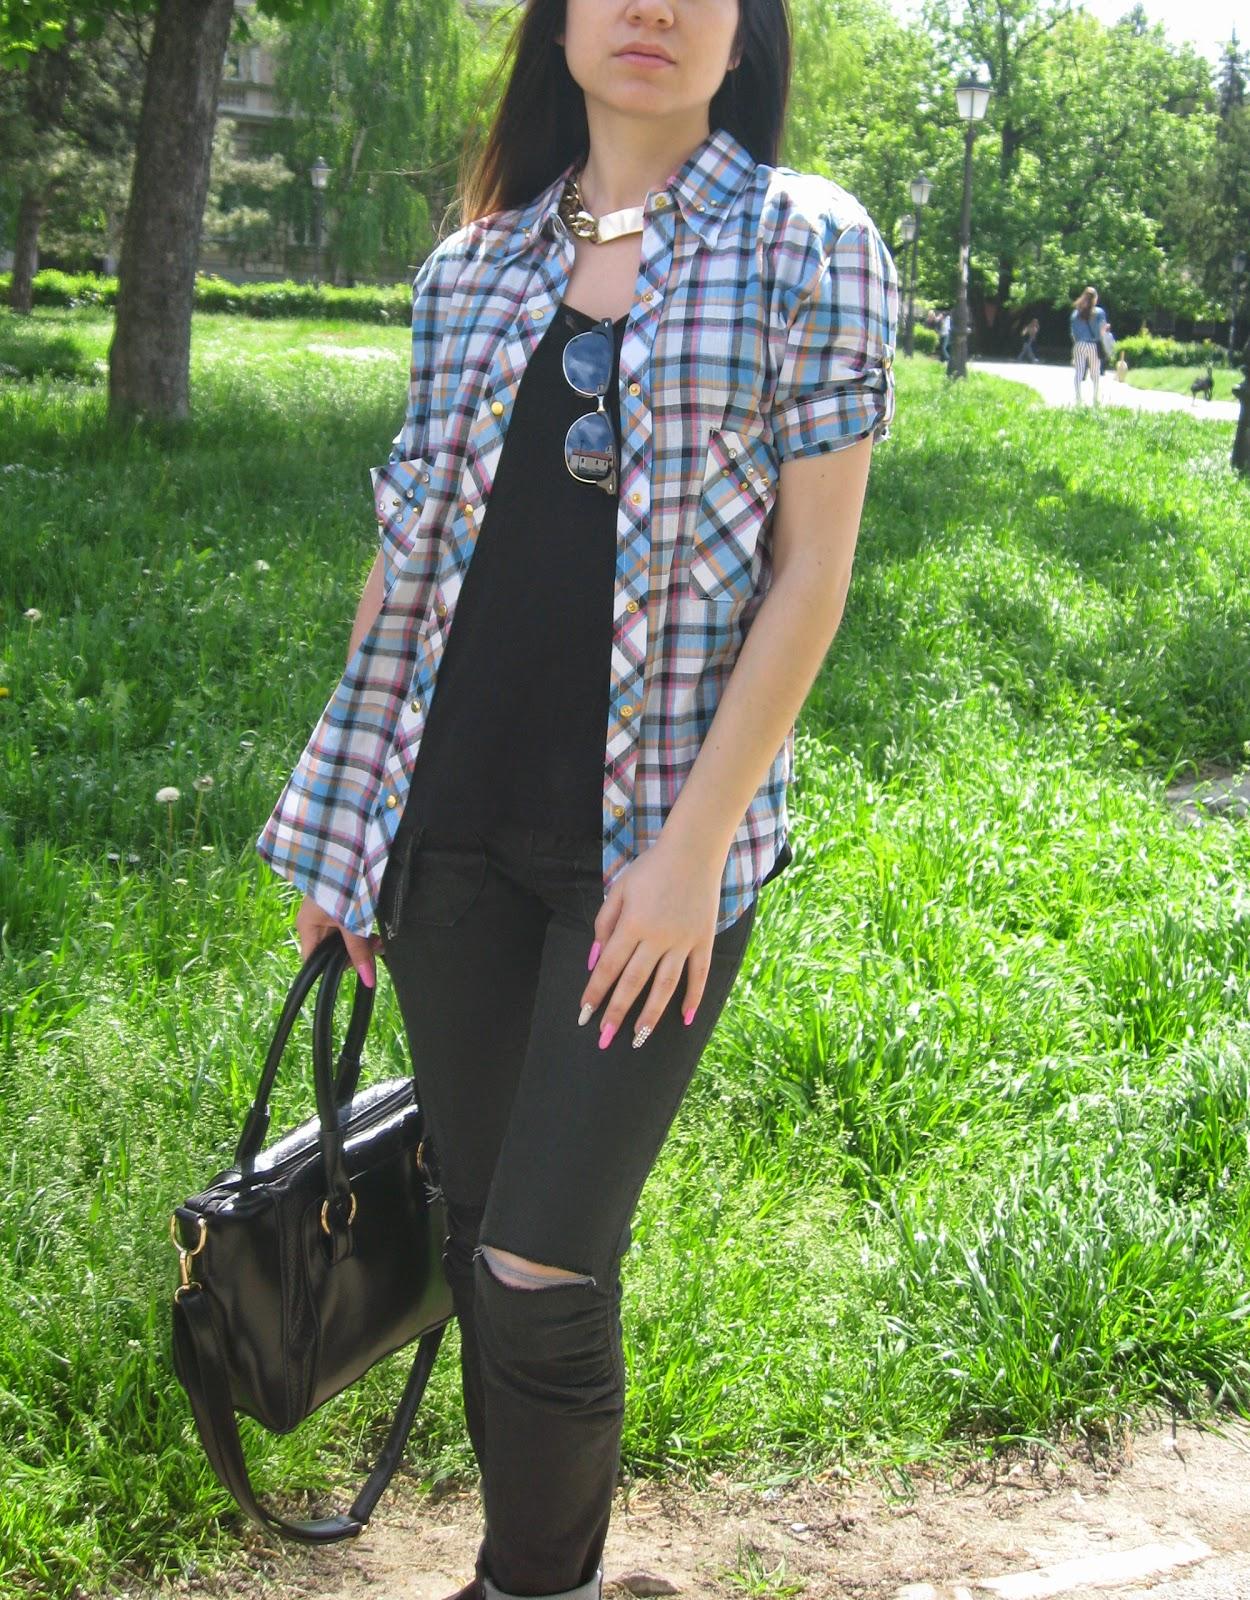 blue plaid shirt, black slip ons, trend slip on sneakers, knee ripped black jeans, black tote bag, vintage new yorker sunglasses, casual look